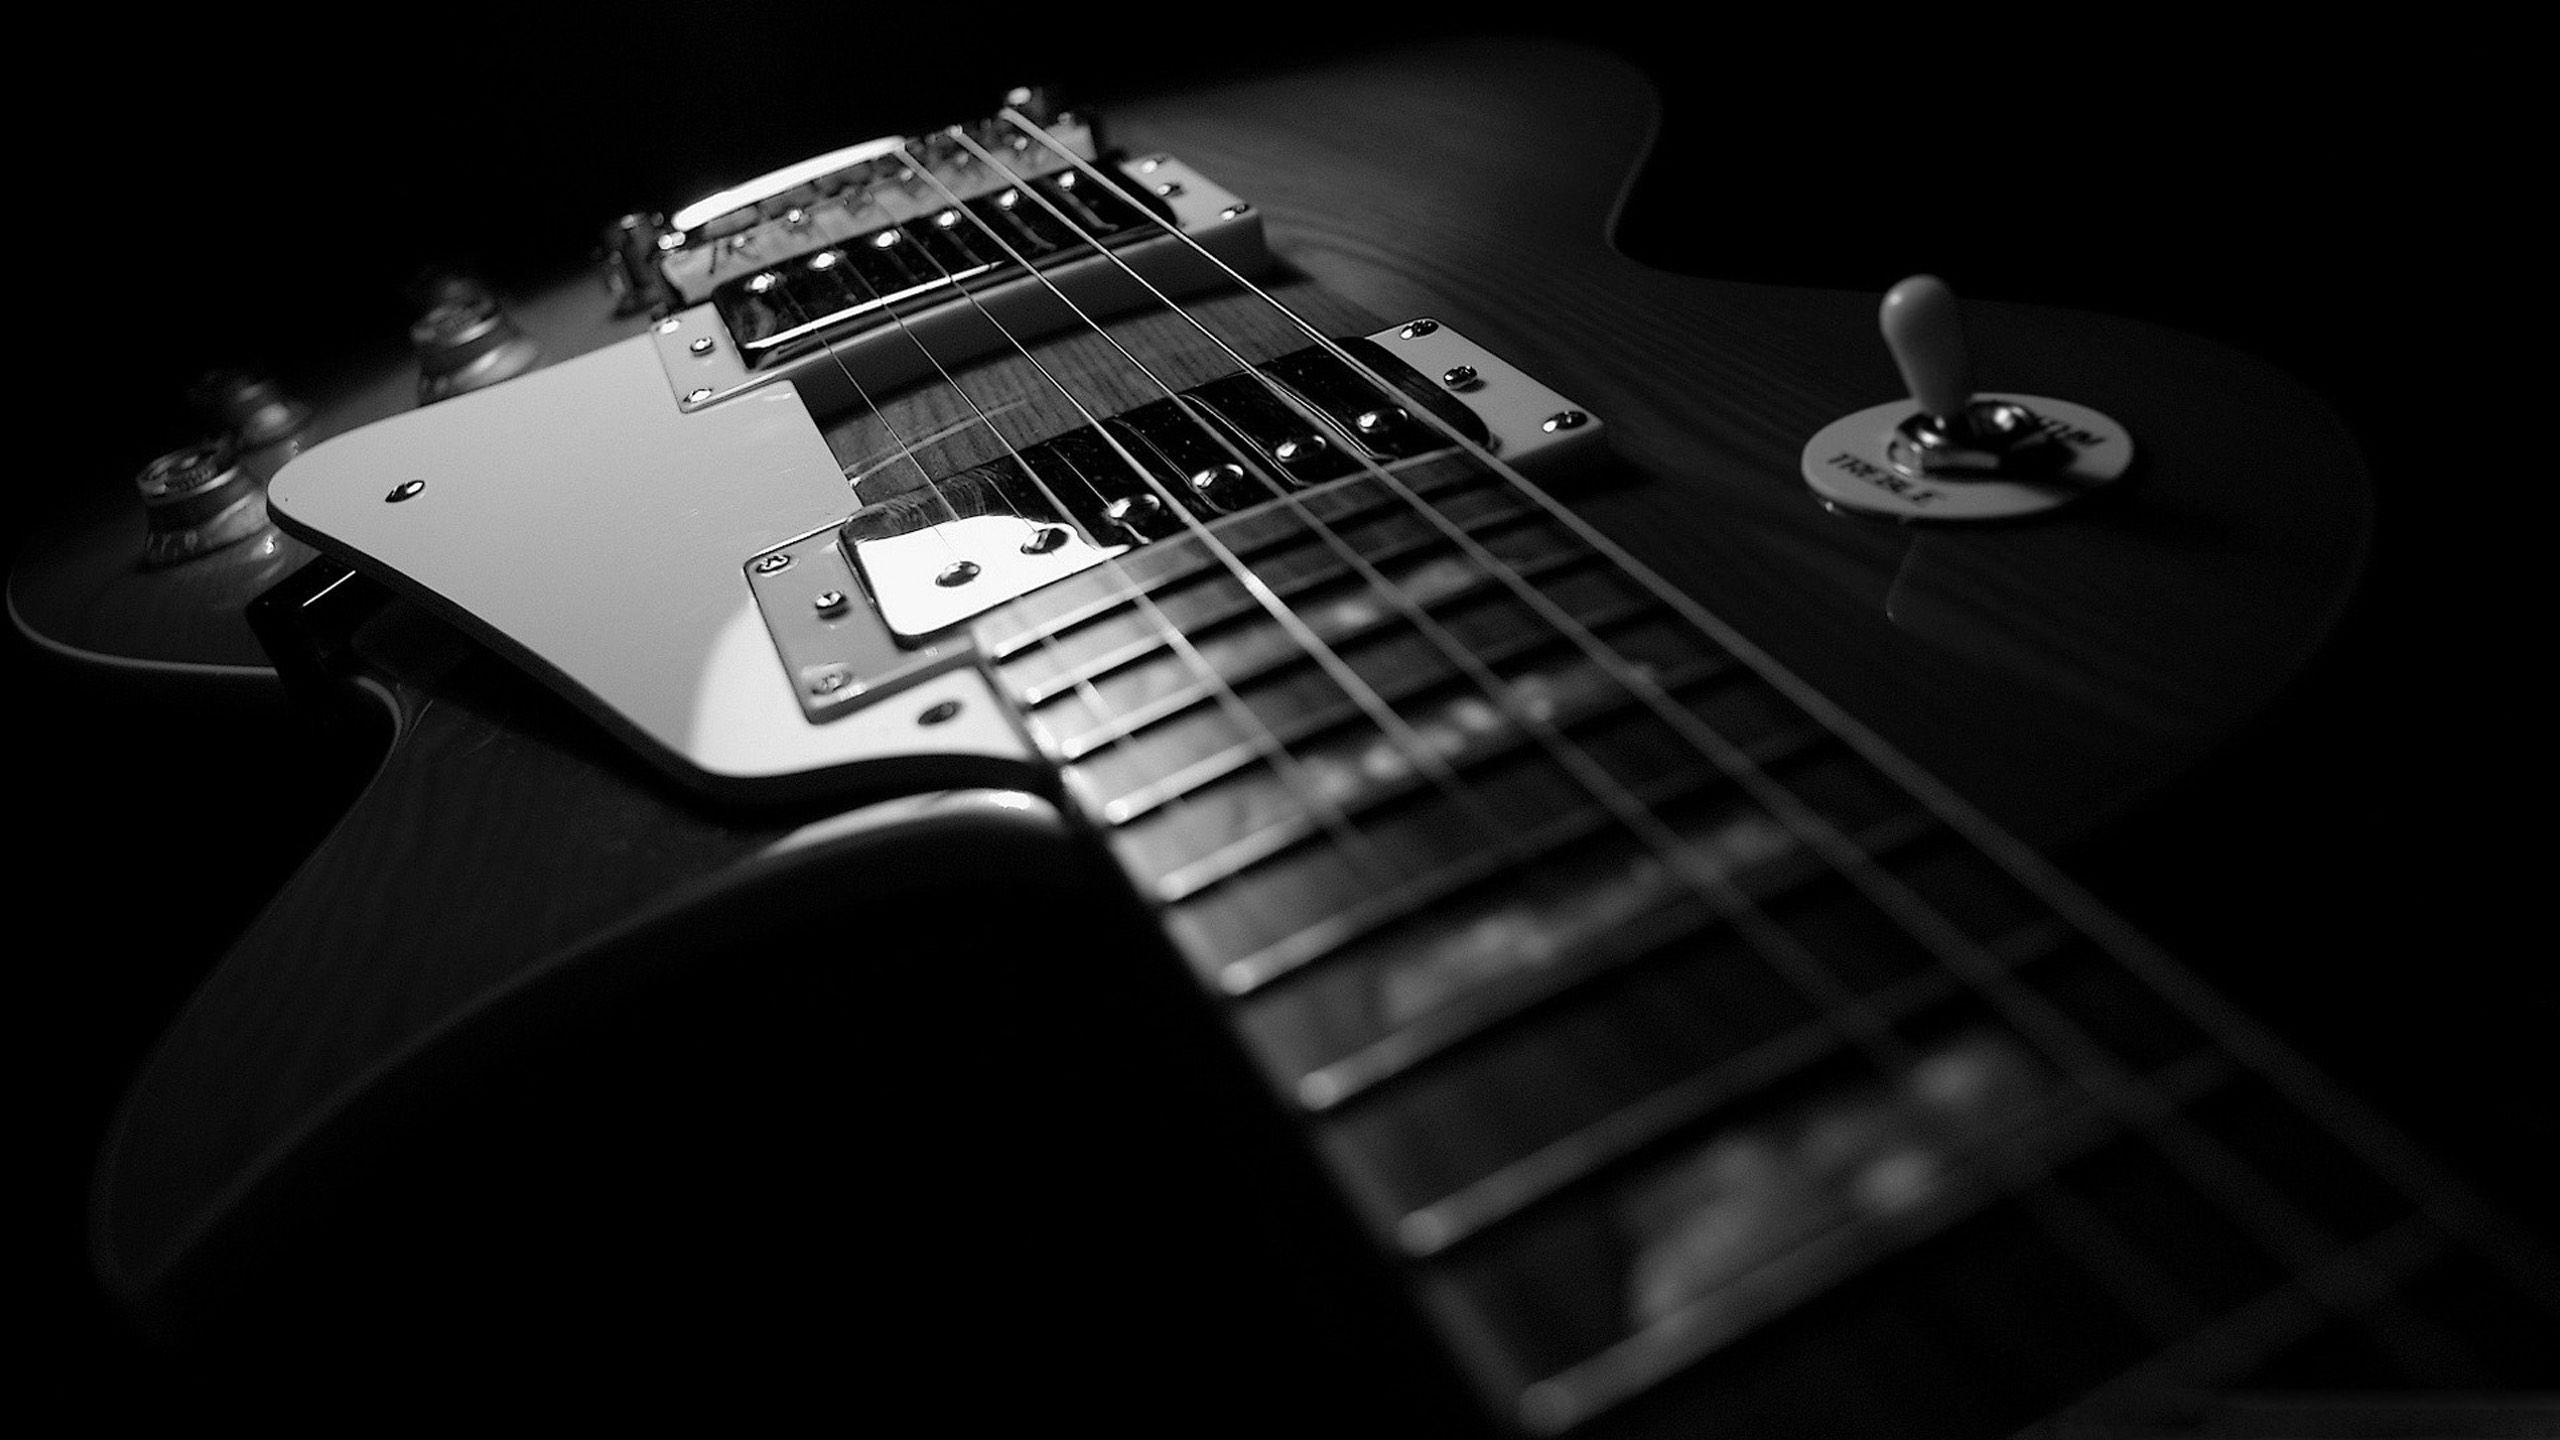 Must see Wallpaper Home Screen Guitar - fbc03655e1638d88a33eed0fc8898fcc  Photograph_284349.jpg